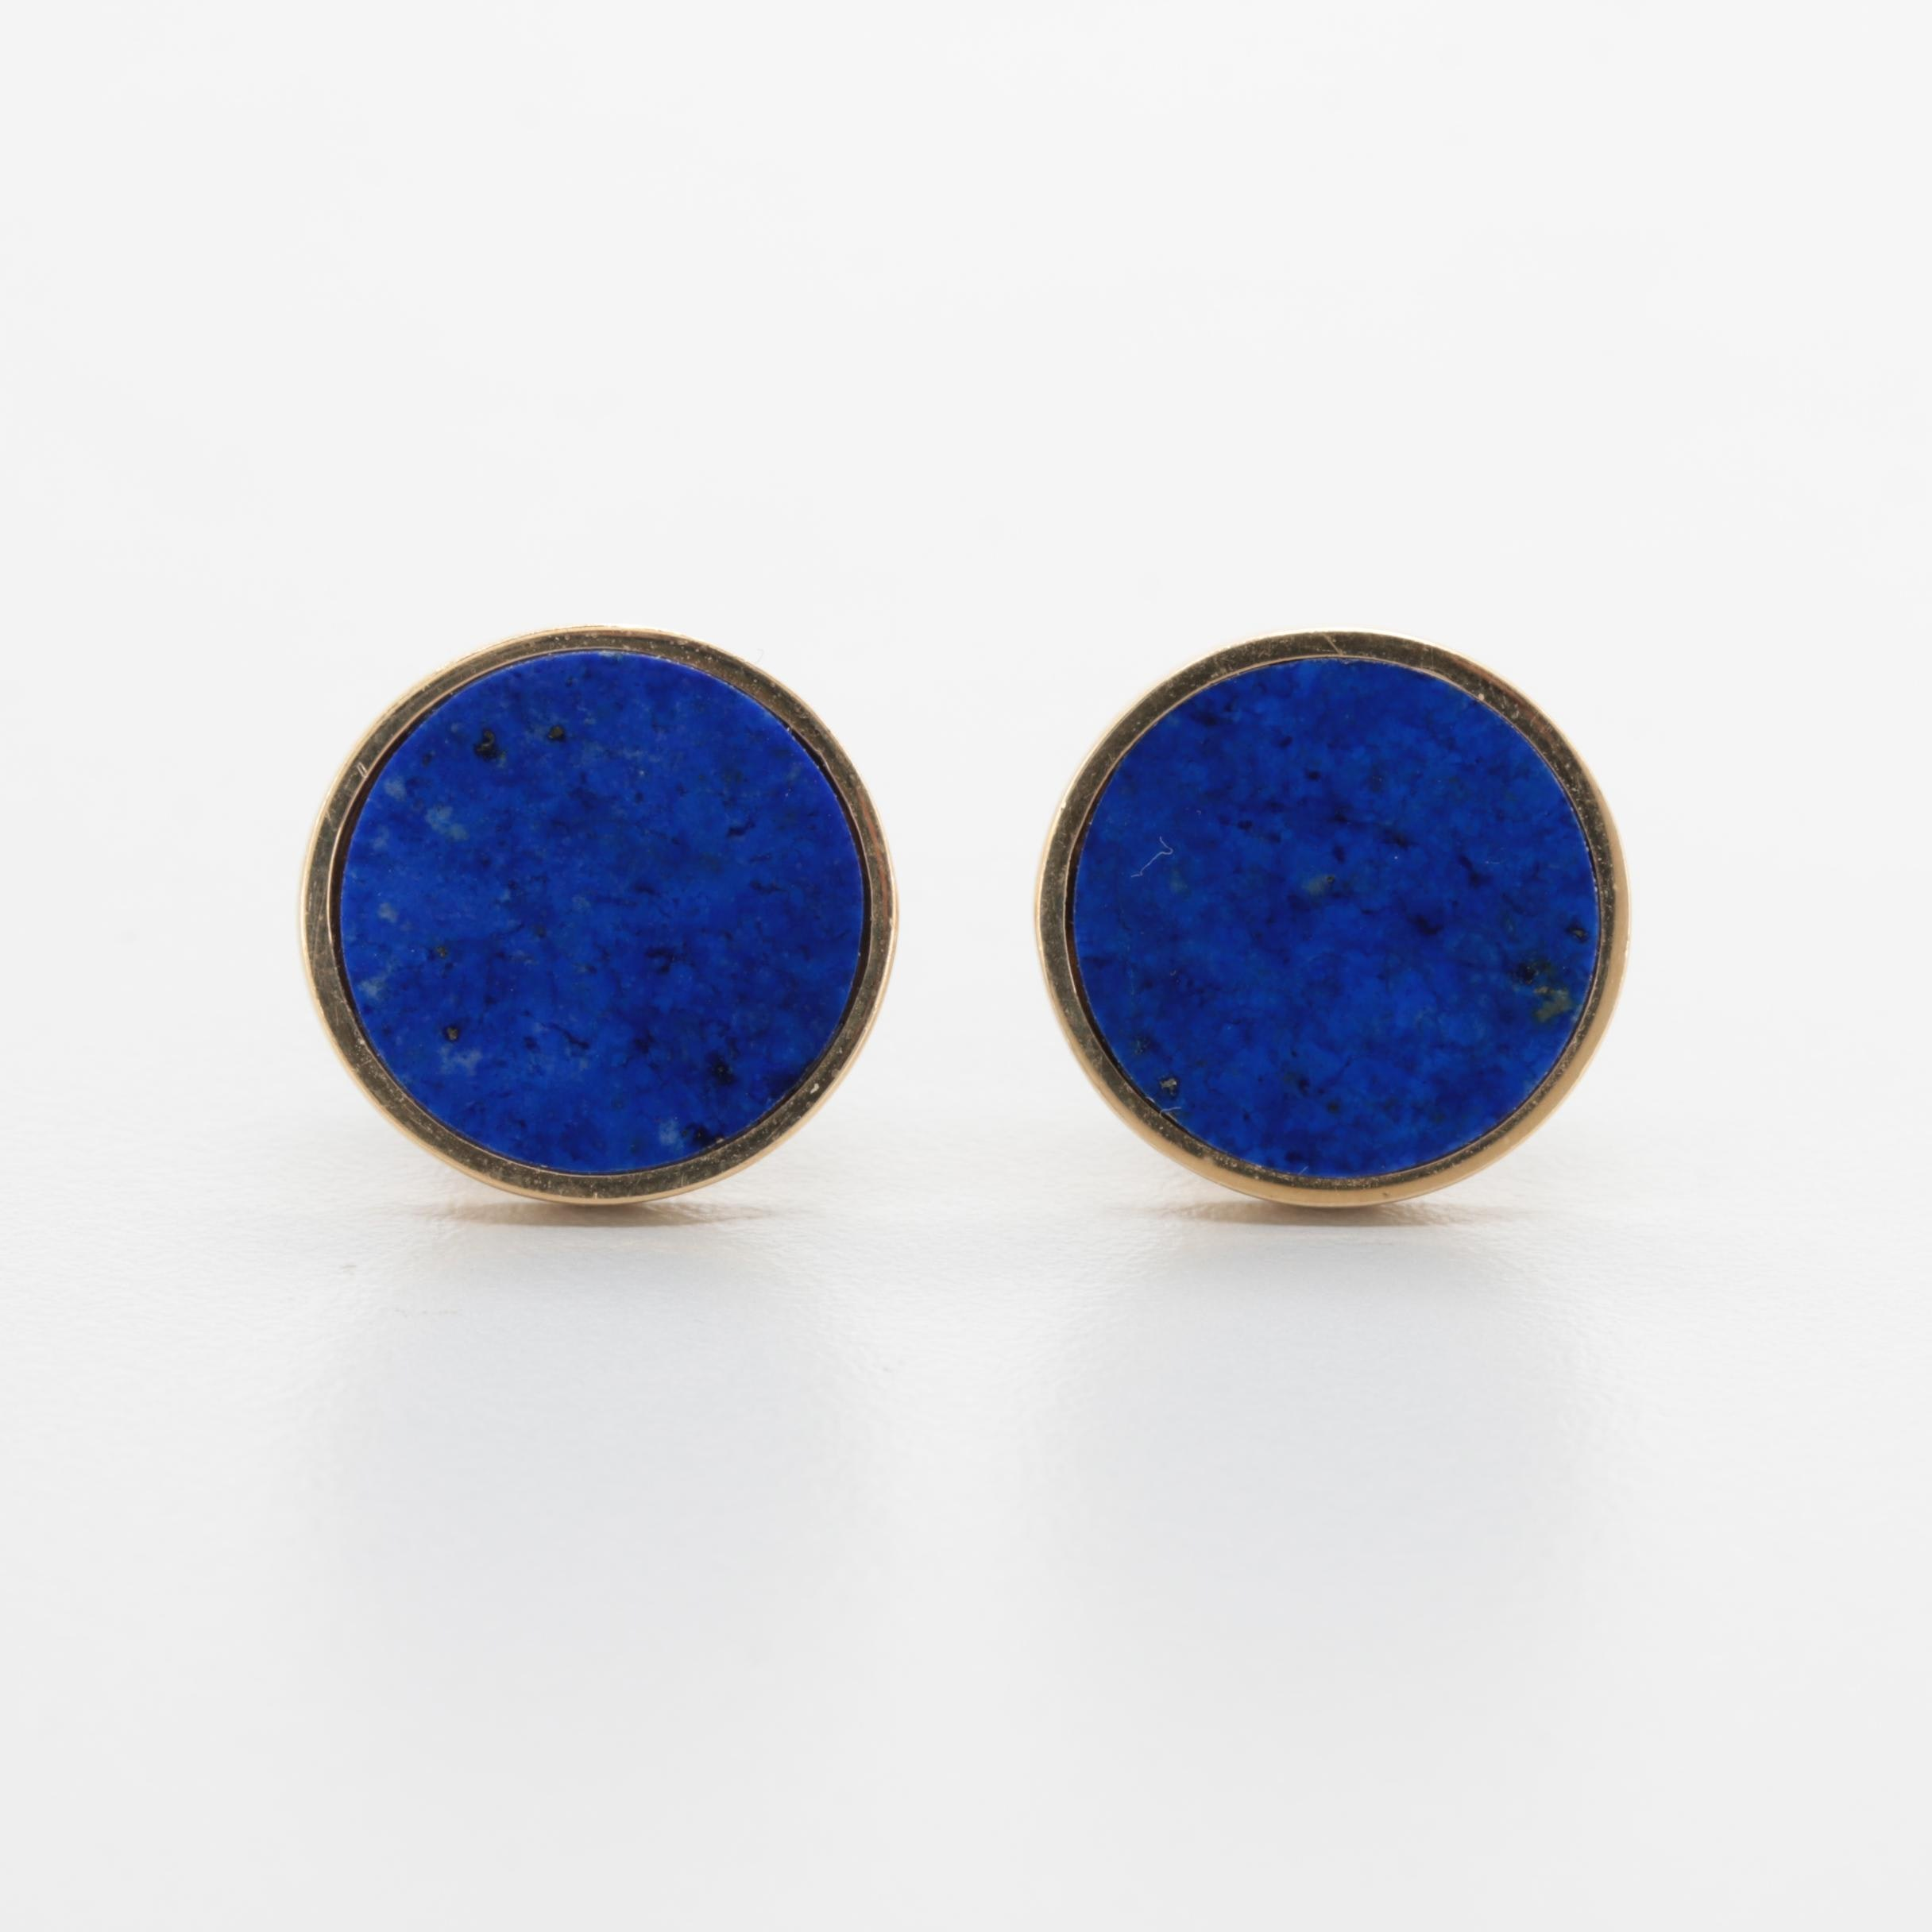 14K Yellow Gold Lapis Lazuli Cufflinks